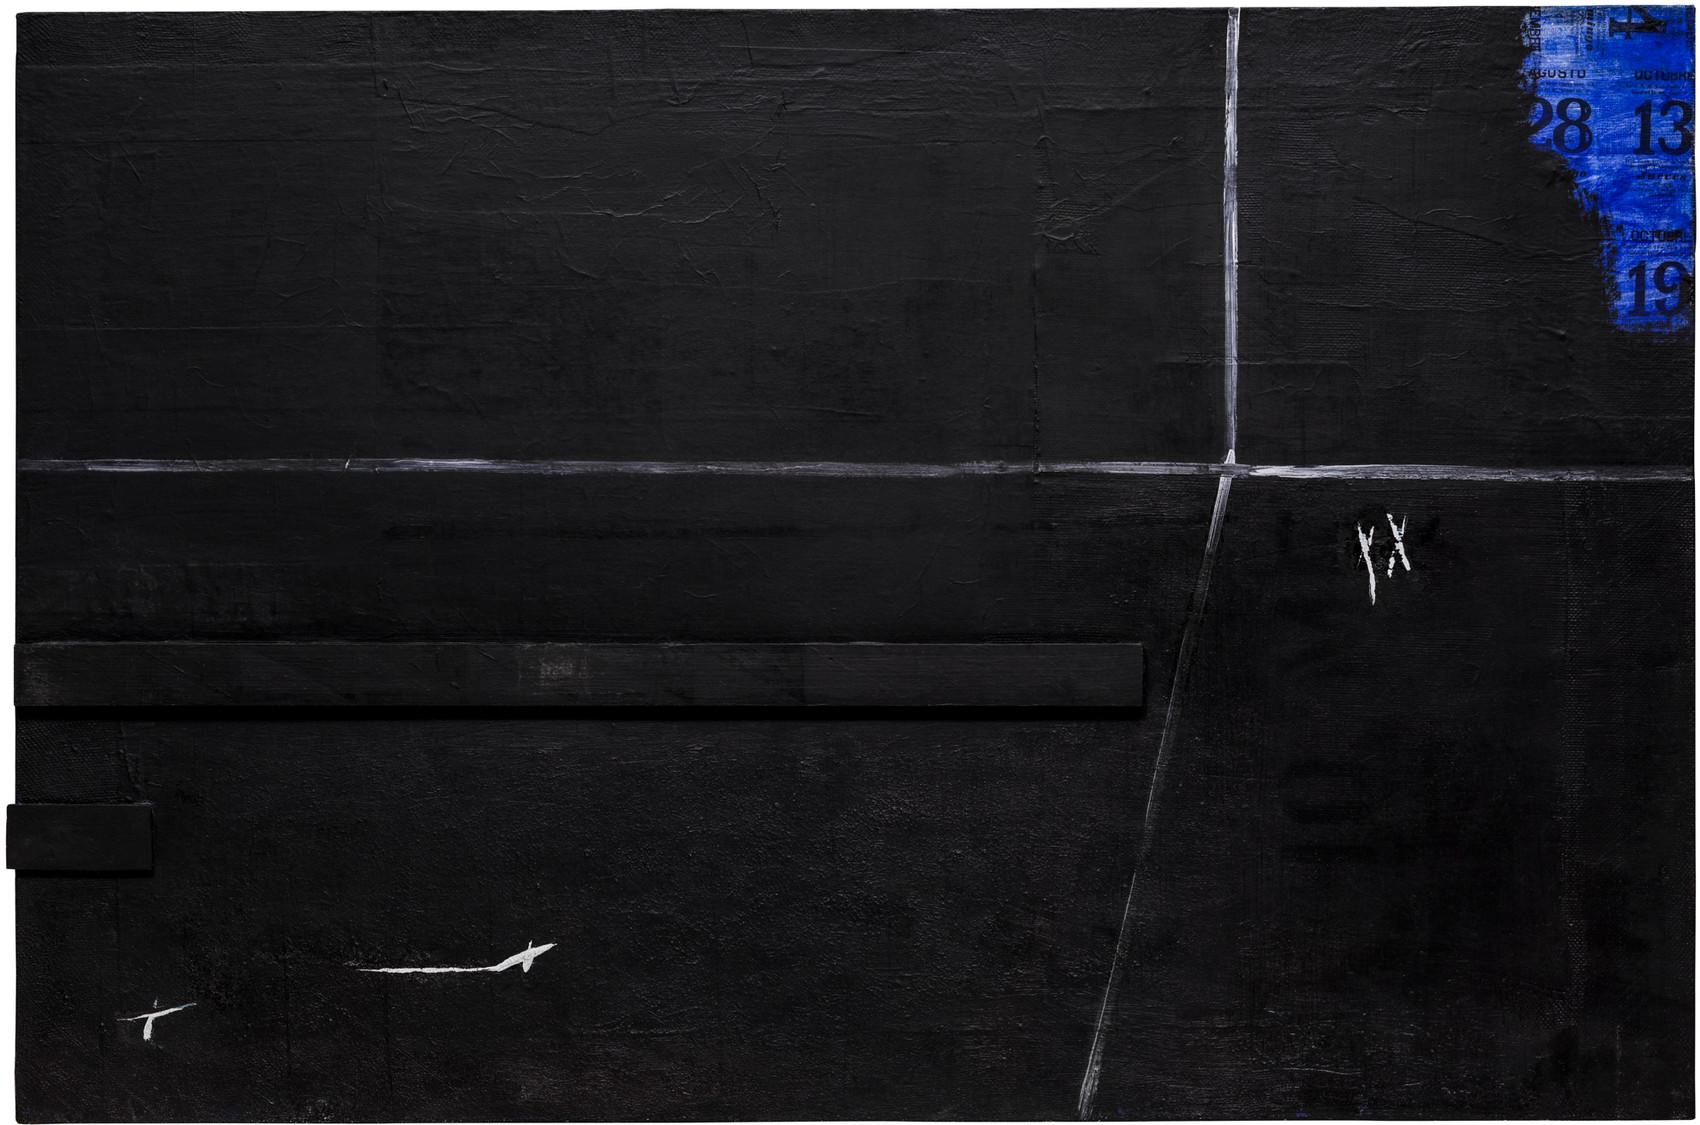 nero bibbia (32) - 2002